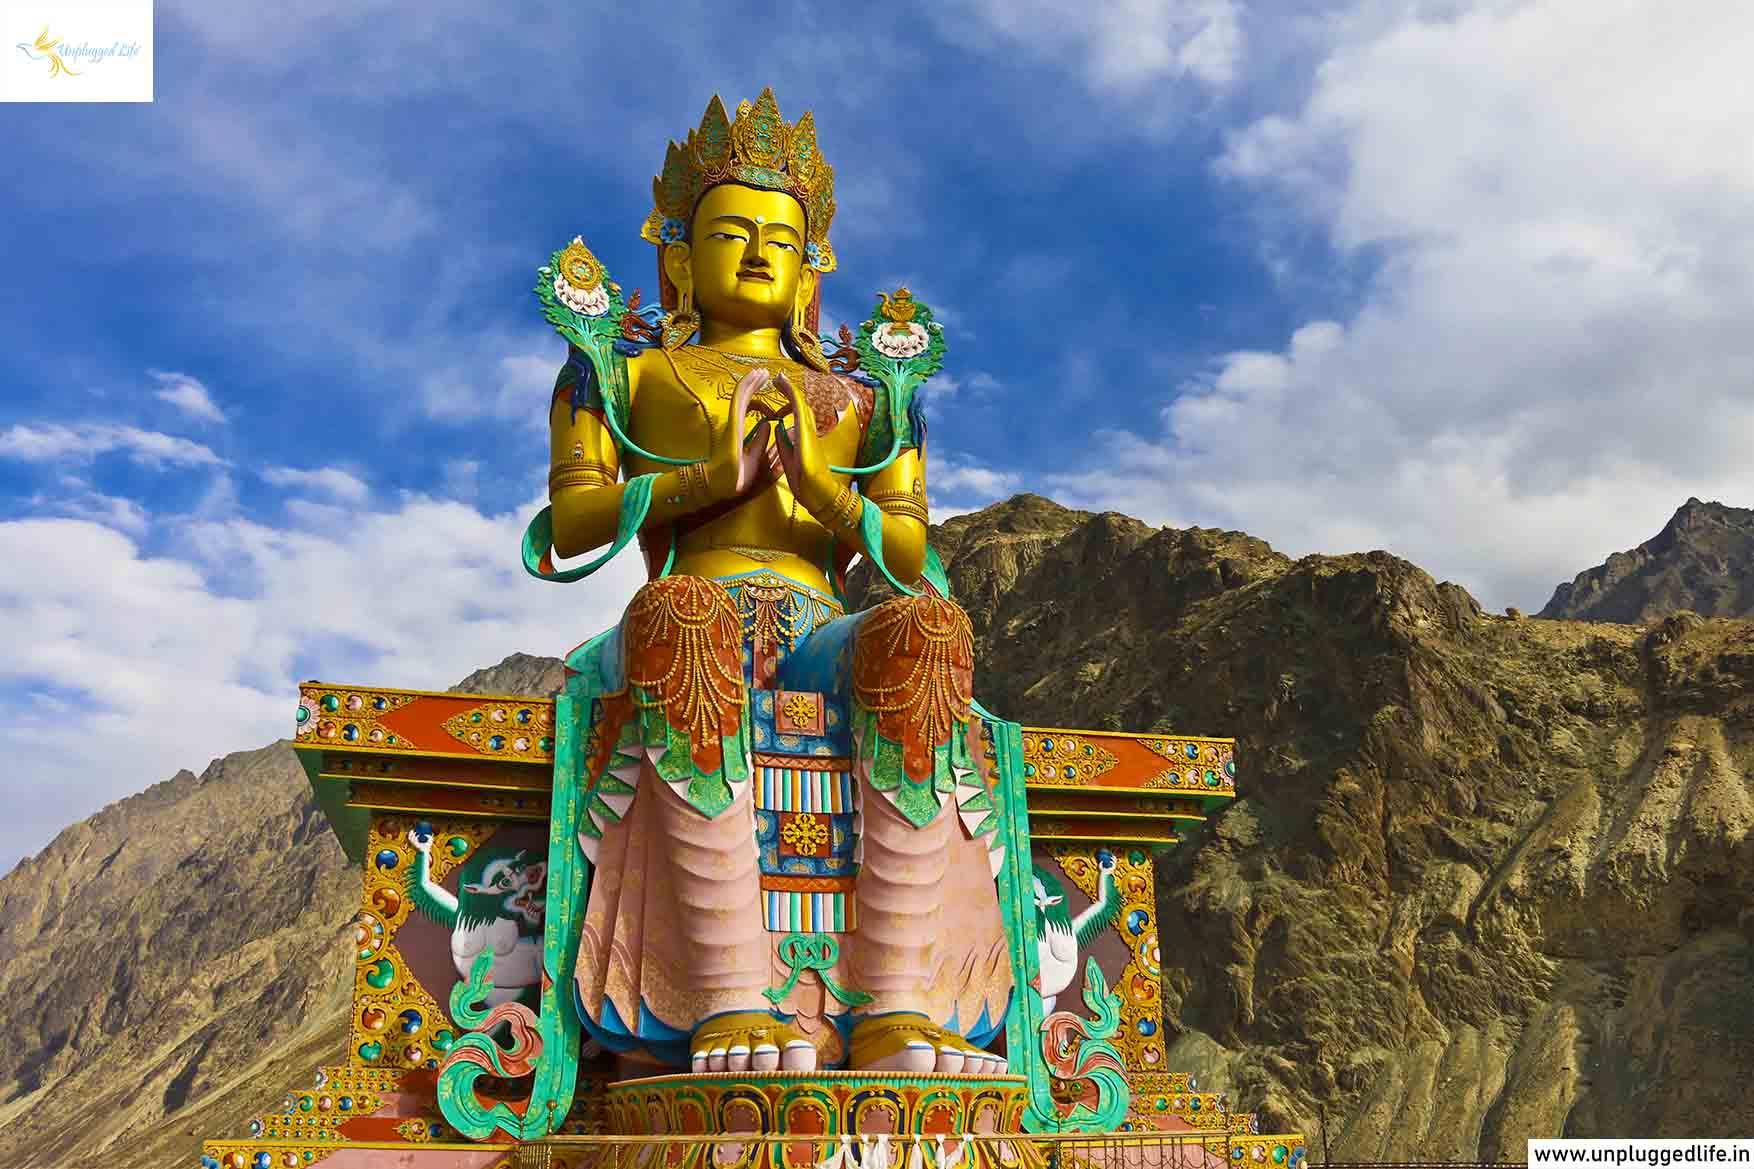 Unplugged Life, Himalayas, Ladakh, Leh View, View of Ladakh, Mountain View, Leh Ladakh Sightseeing Tour, Leh Ladakh Package, Book Ladakh Trip, Top Places in Ladakh, Sightseeing in Leh-Ladakh, Ladakh View, Leh Ladakh View, Landscape in Ladakh, Himalayan village, Ladakh by Air, Window View, Flying to Ladakh, Ladakh Mountain, Mountain View, View of Himalaya, Ladakh by Flight, Landscape, Mountains, Leh to Nubra Valley, Hunder Sand Dunes, Sand Dunes in Hunder Nubra Valley, Nubra Valley Sand Dunes, Sand Dunes in Nubra Valley, Nubra Valley Desert, Desert in Hunder Nubra Valley, Ladakh Sand Dunes Khardung La Top, Leh to Nubra Valley, Nubra Valley to Leh, Leh to Hunder, Diskit to Leh, Leh to Diskit, 100 ft. statue of Maitreya Buddha statue at Diskit, Nubra valley, Ladakh